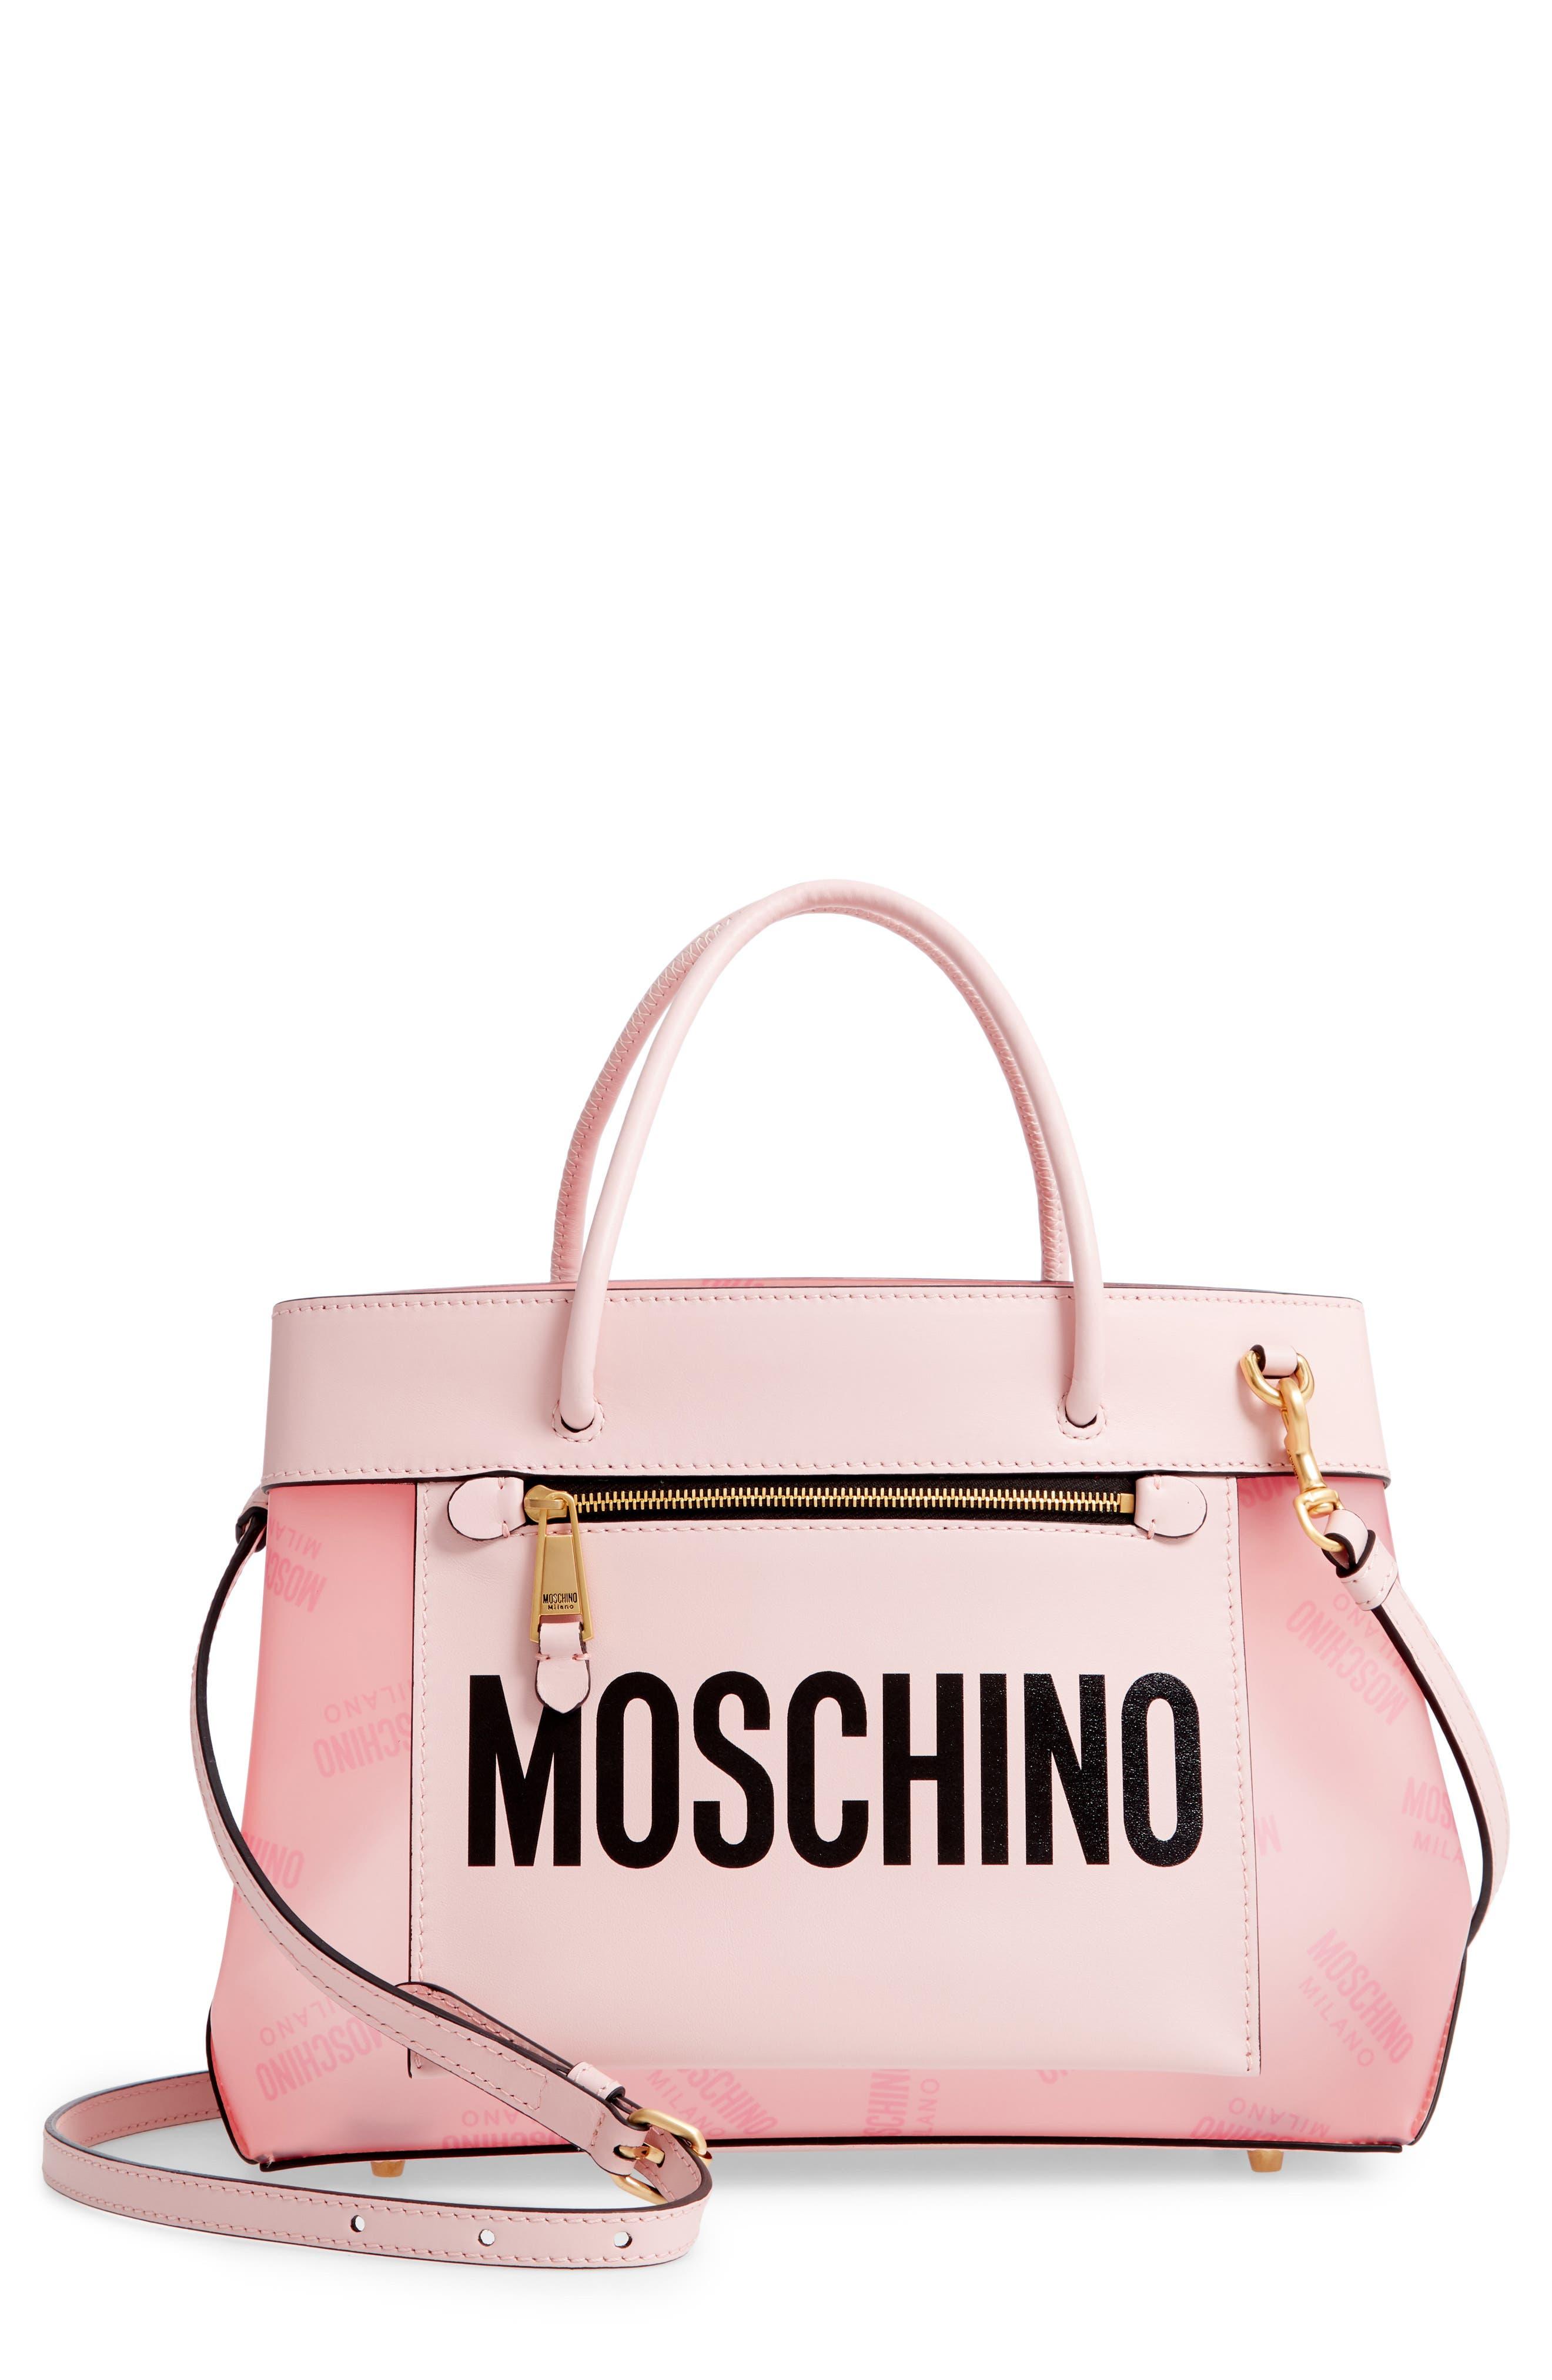 MOSCHINO,                             Translucent Logo Tote,                             Main thumbnail 1, color,                             PINK